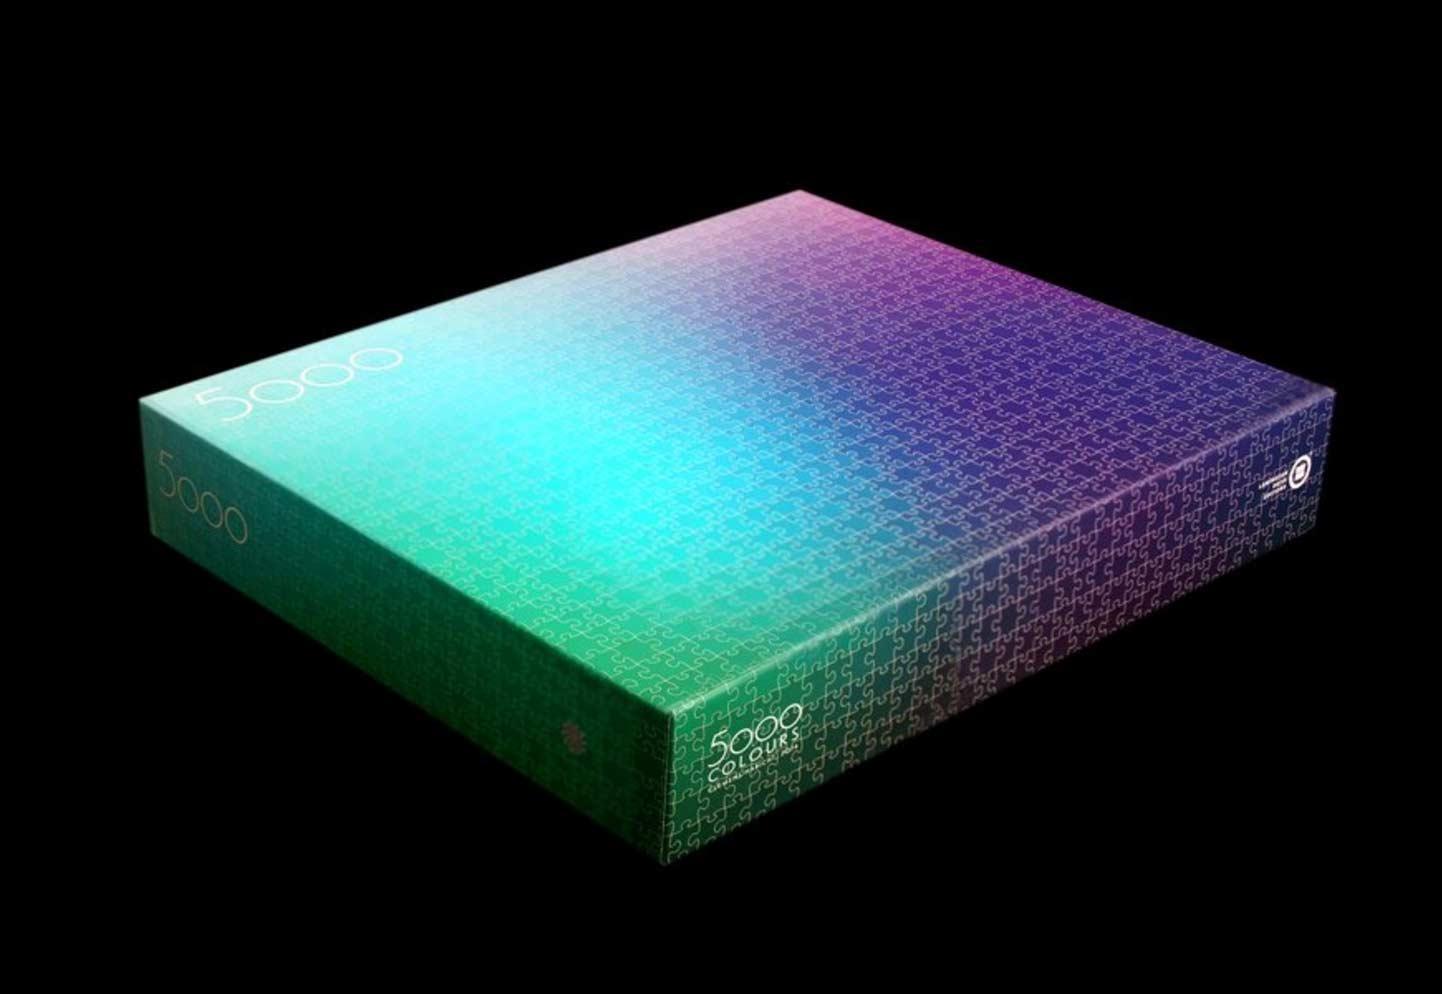 Farbverlauf-Puzzle mit 5.000 Teilen 5000-colors-puzzle_02